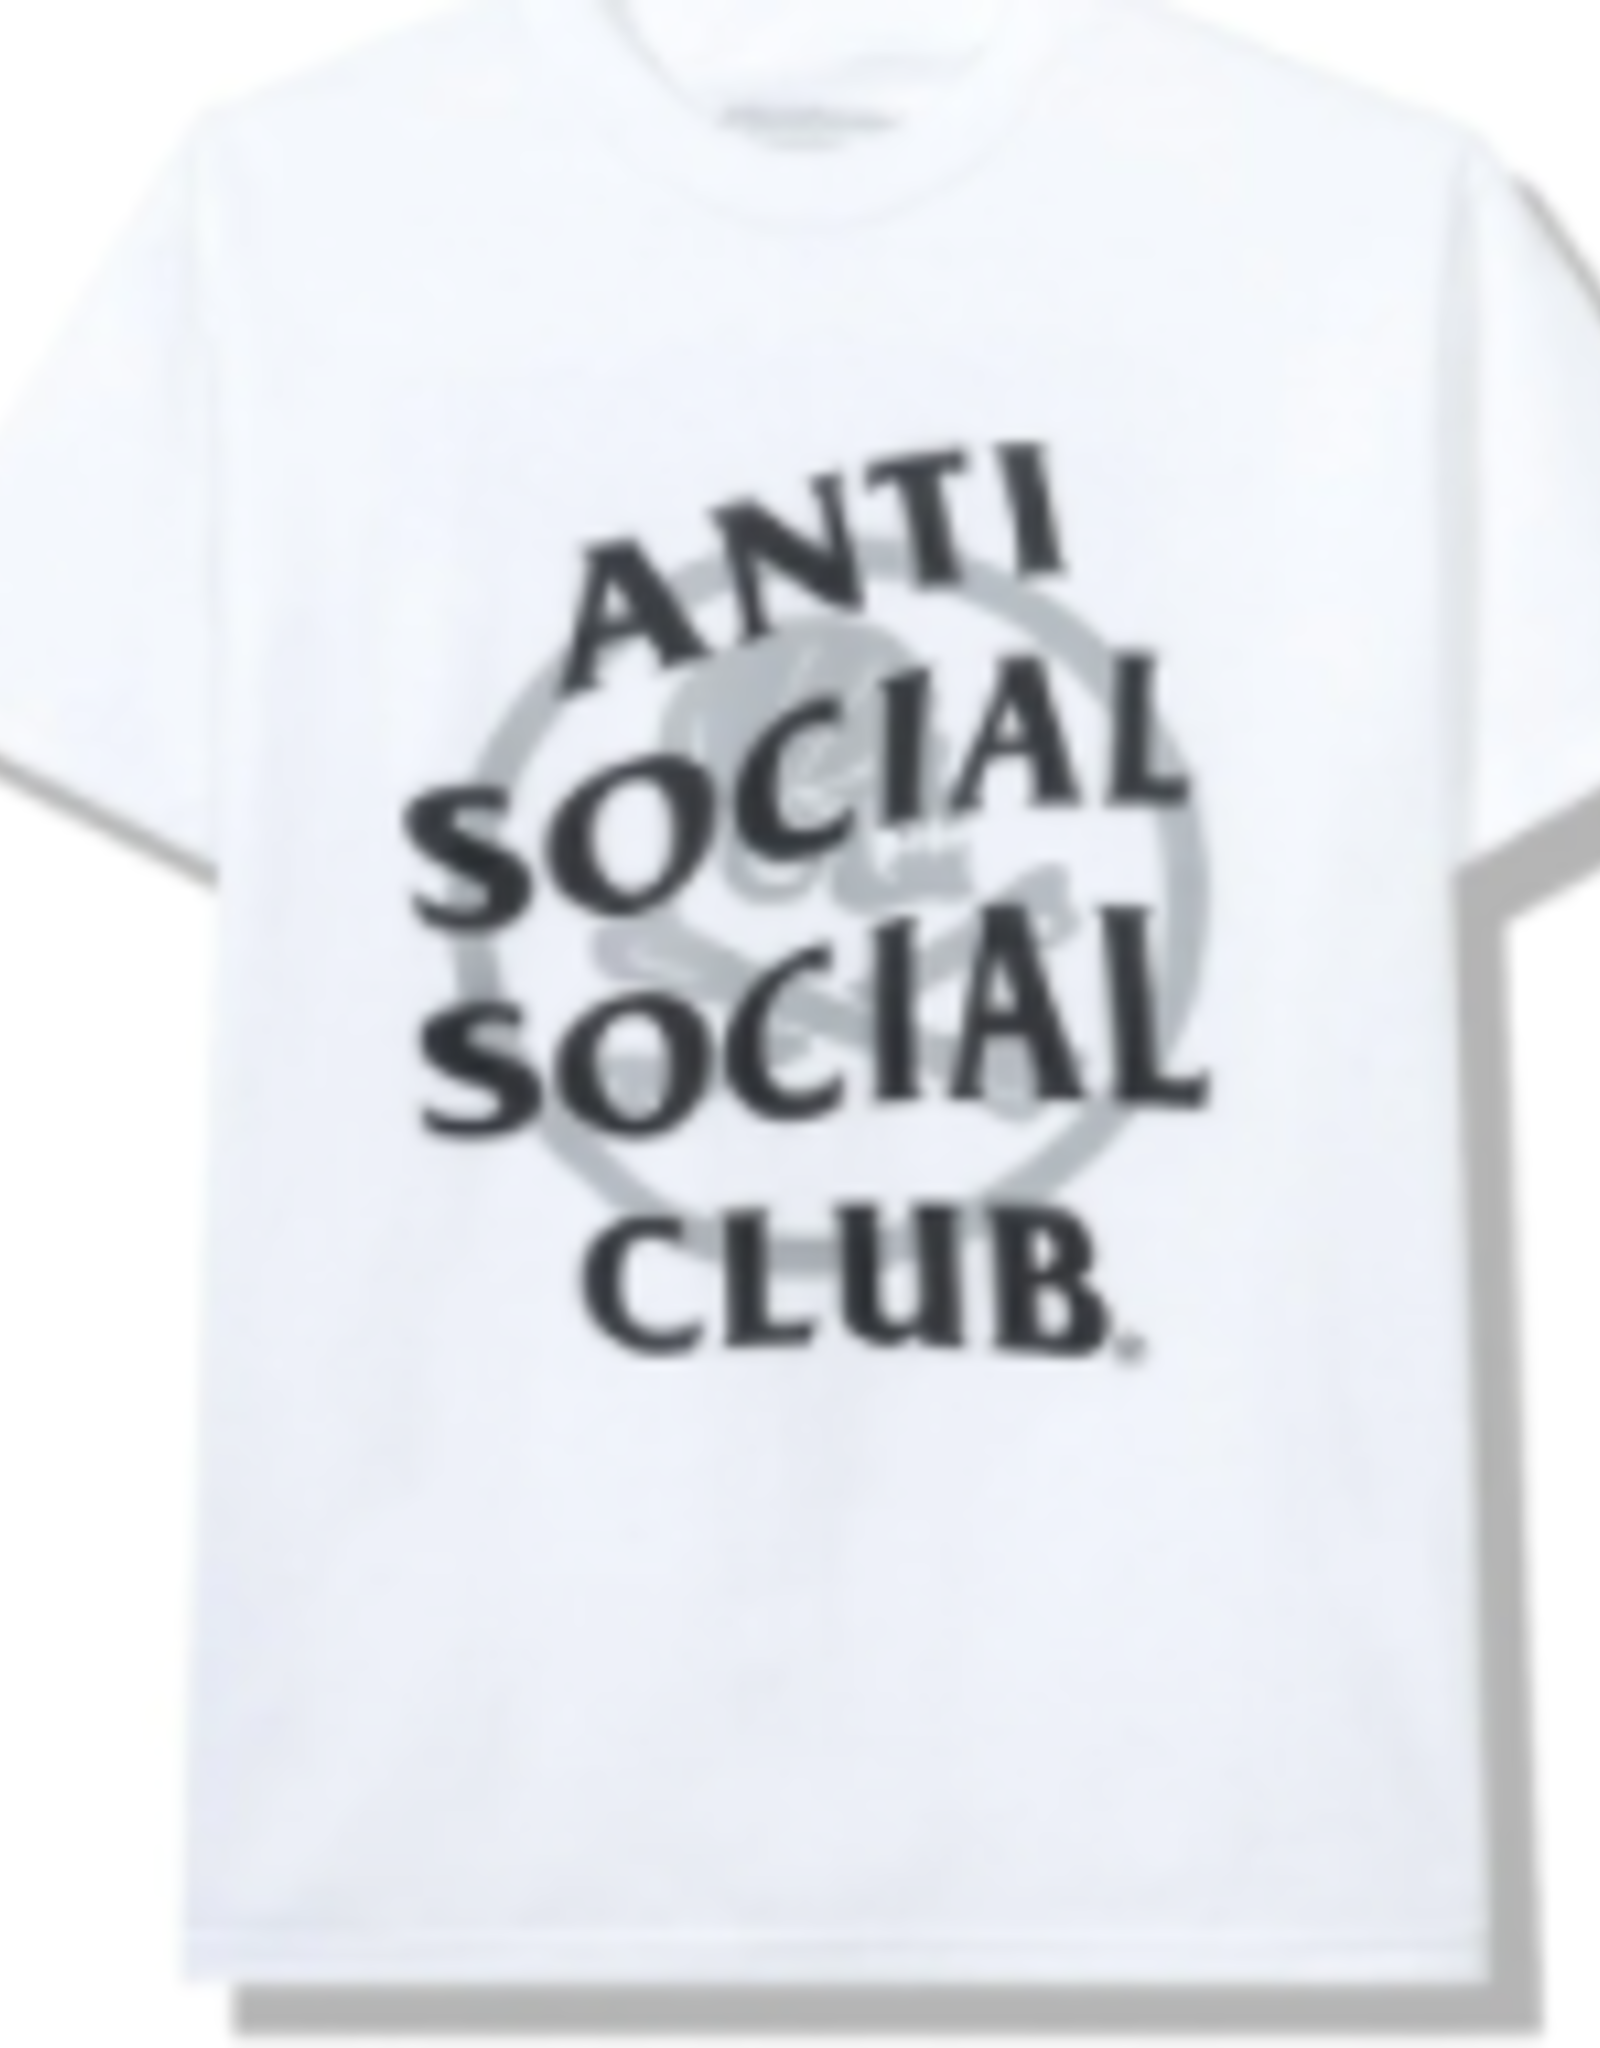 ASSC Anti Social Social Club x Neighborhood Cambered White Tee Tee White